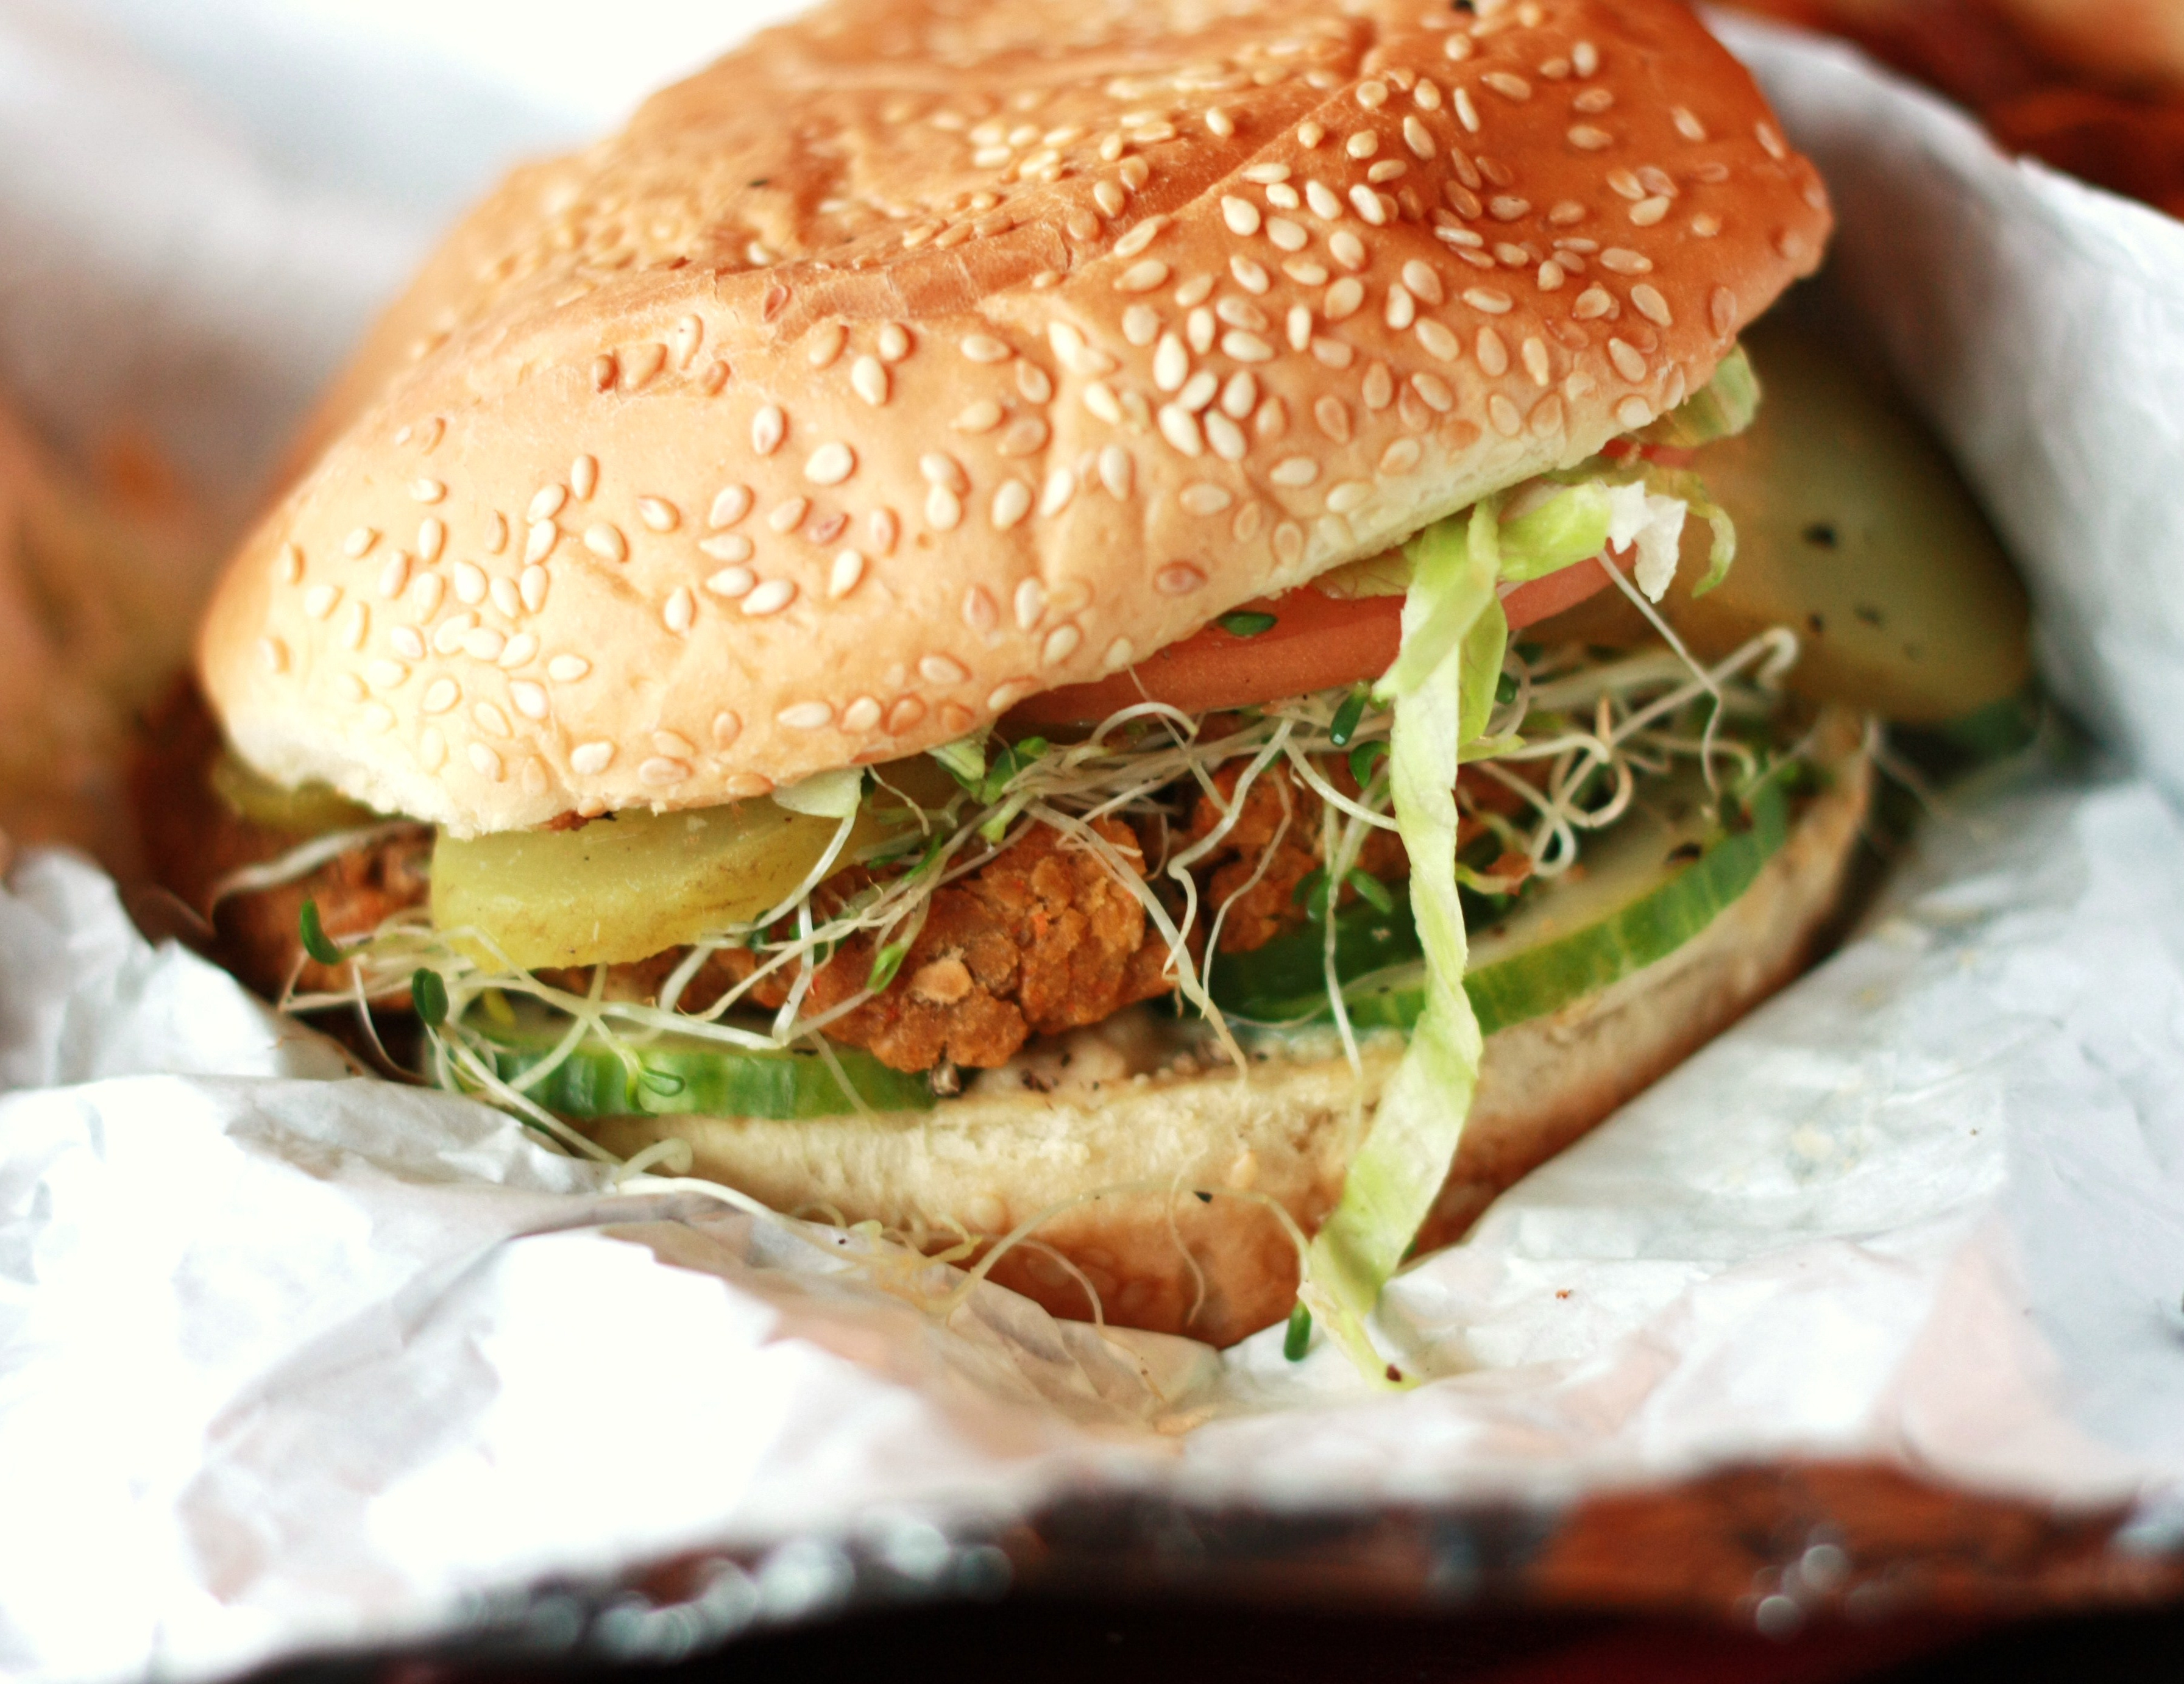 Gourmet Vegetarian Burger Restaurants